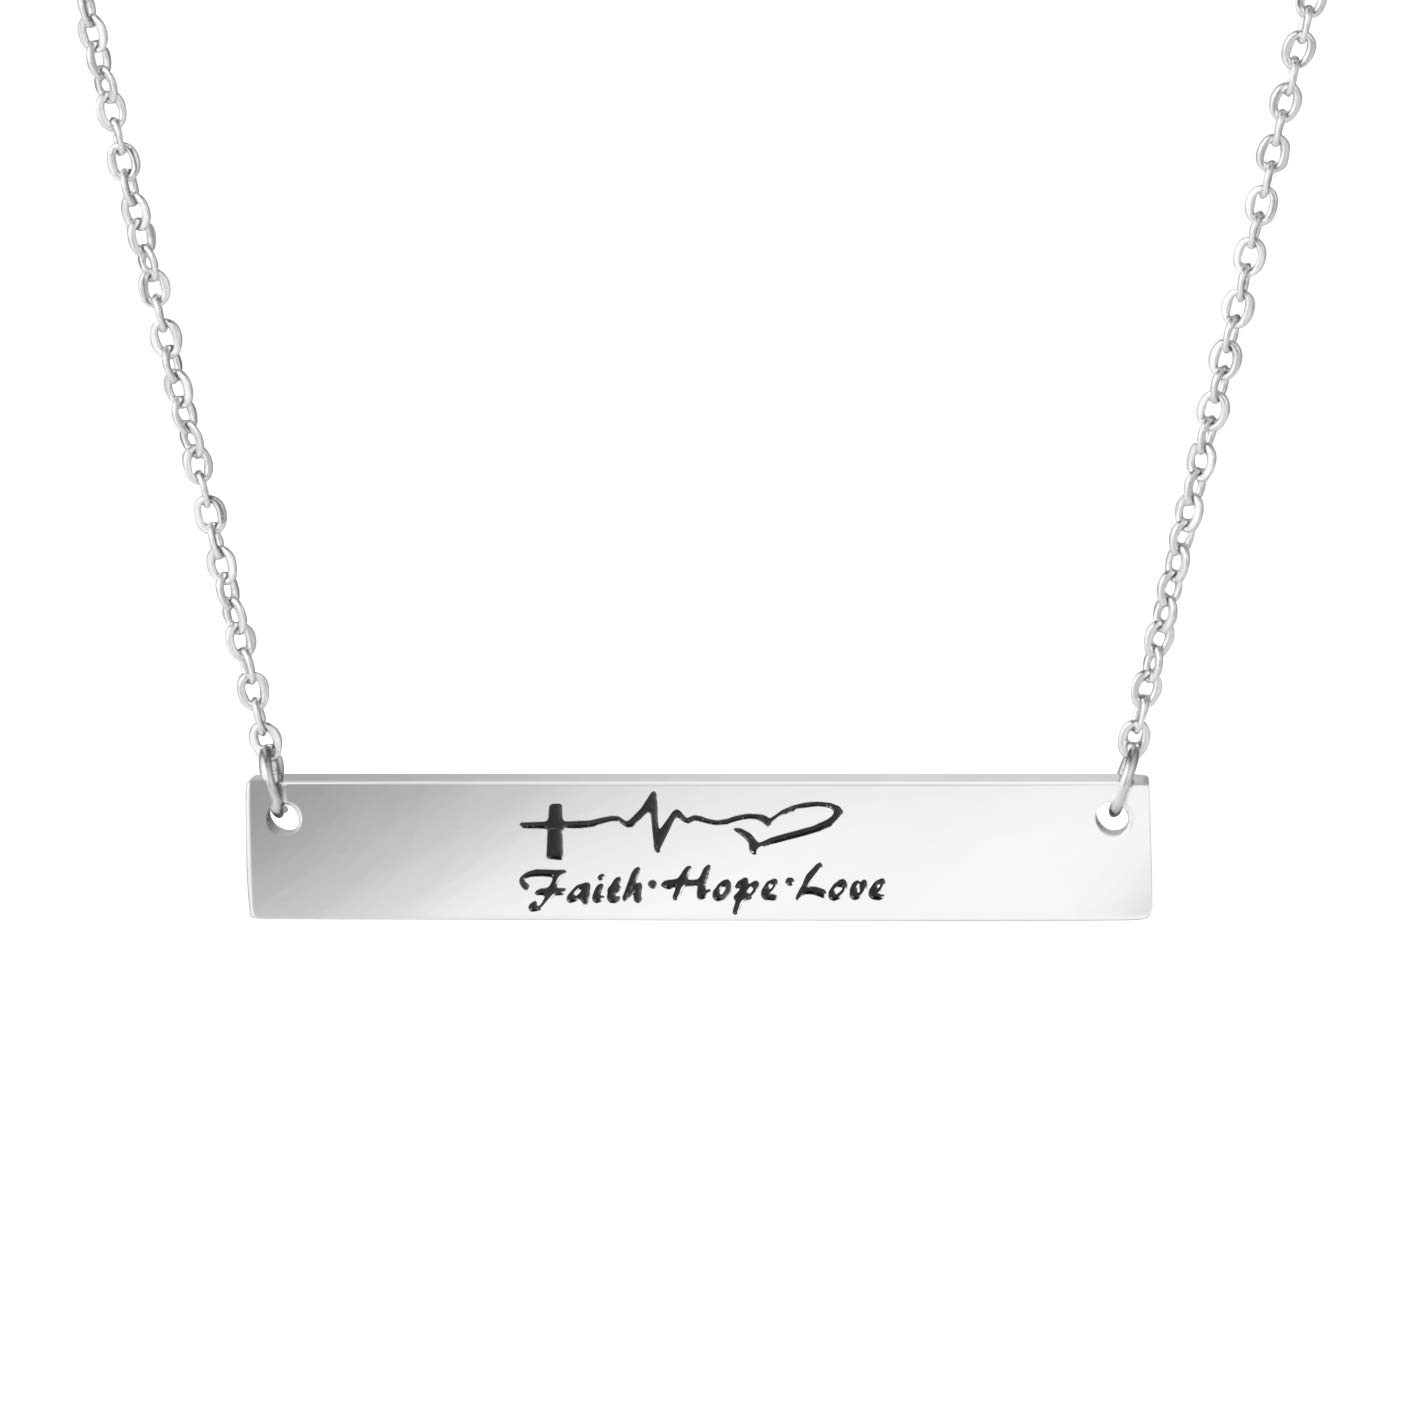 Awegift Faith Hope Love Inspirational Pendant Bar Necklace Women Gift Jewelry